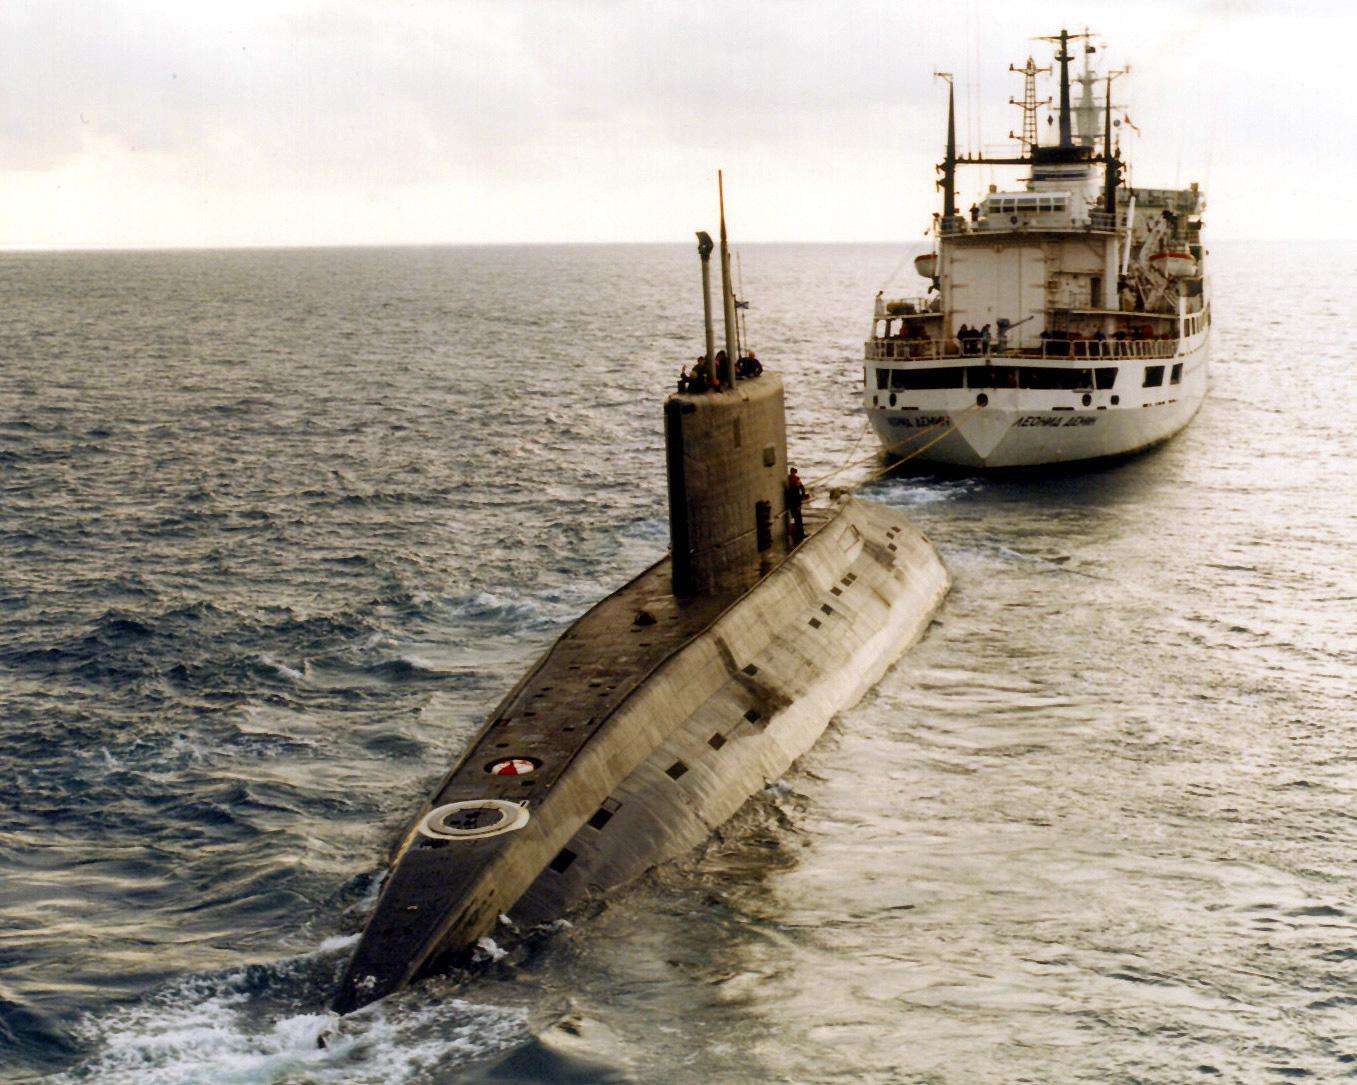 https://upload.wikimedia.org/wikipedia/commons/5/5b/Iranian_Kilo-class_submarine.jpg